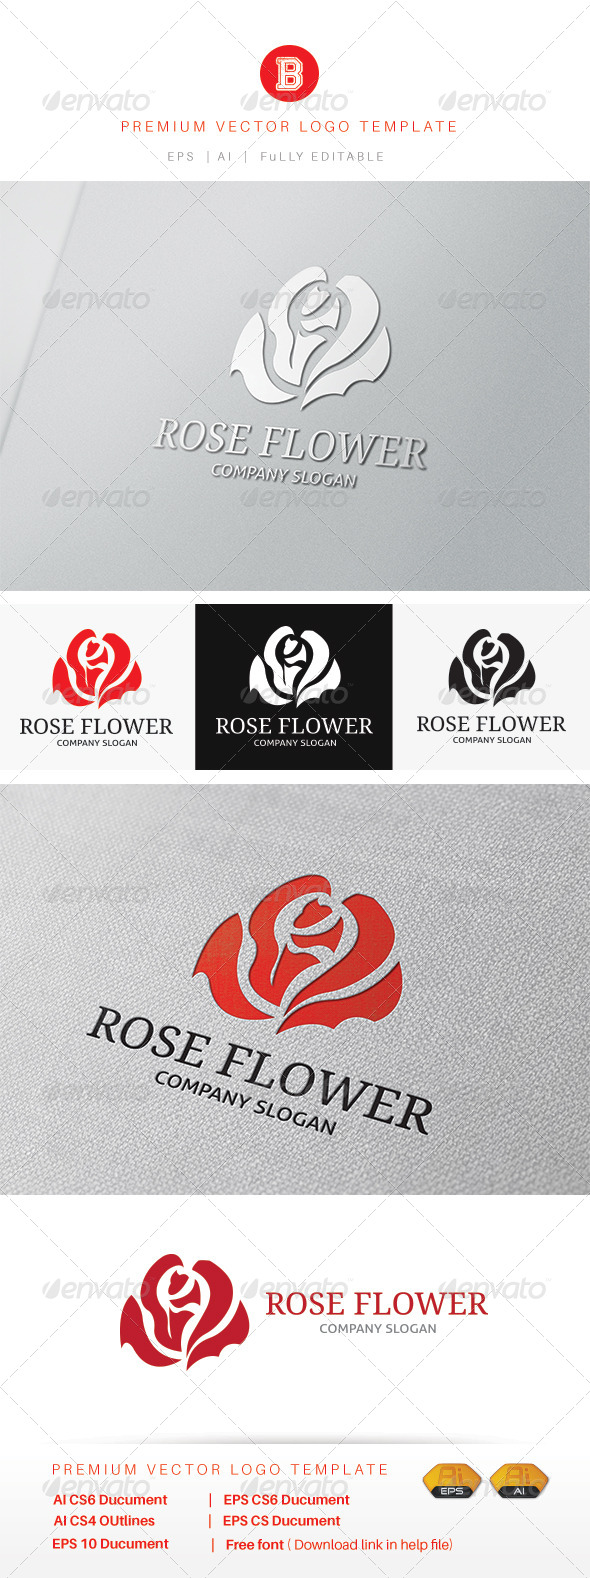 GraphicRiver Rose Flower 7997865